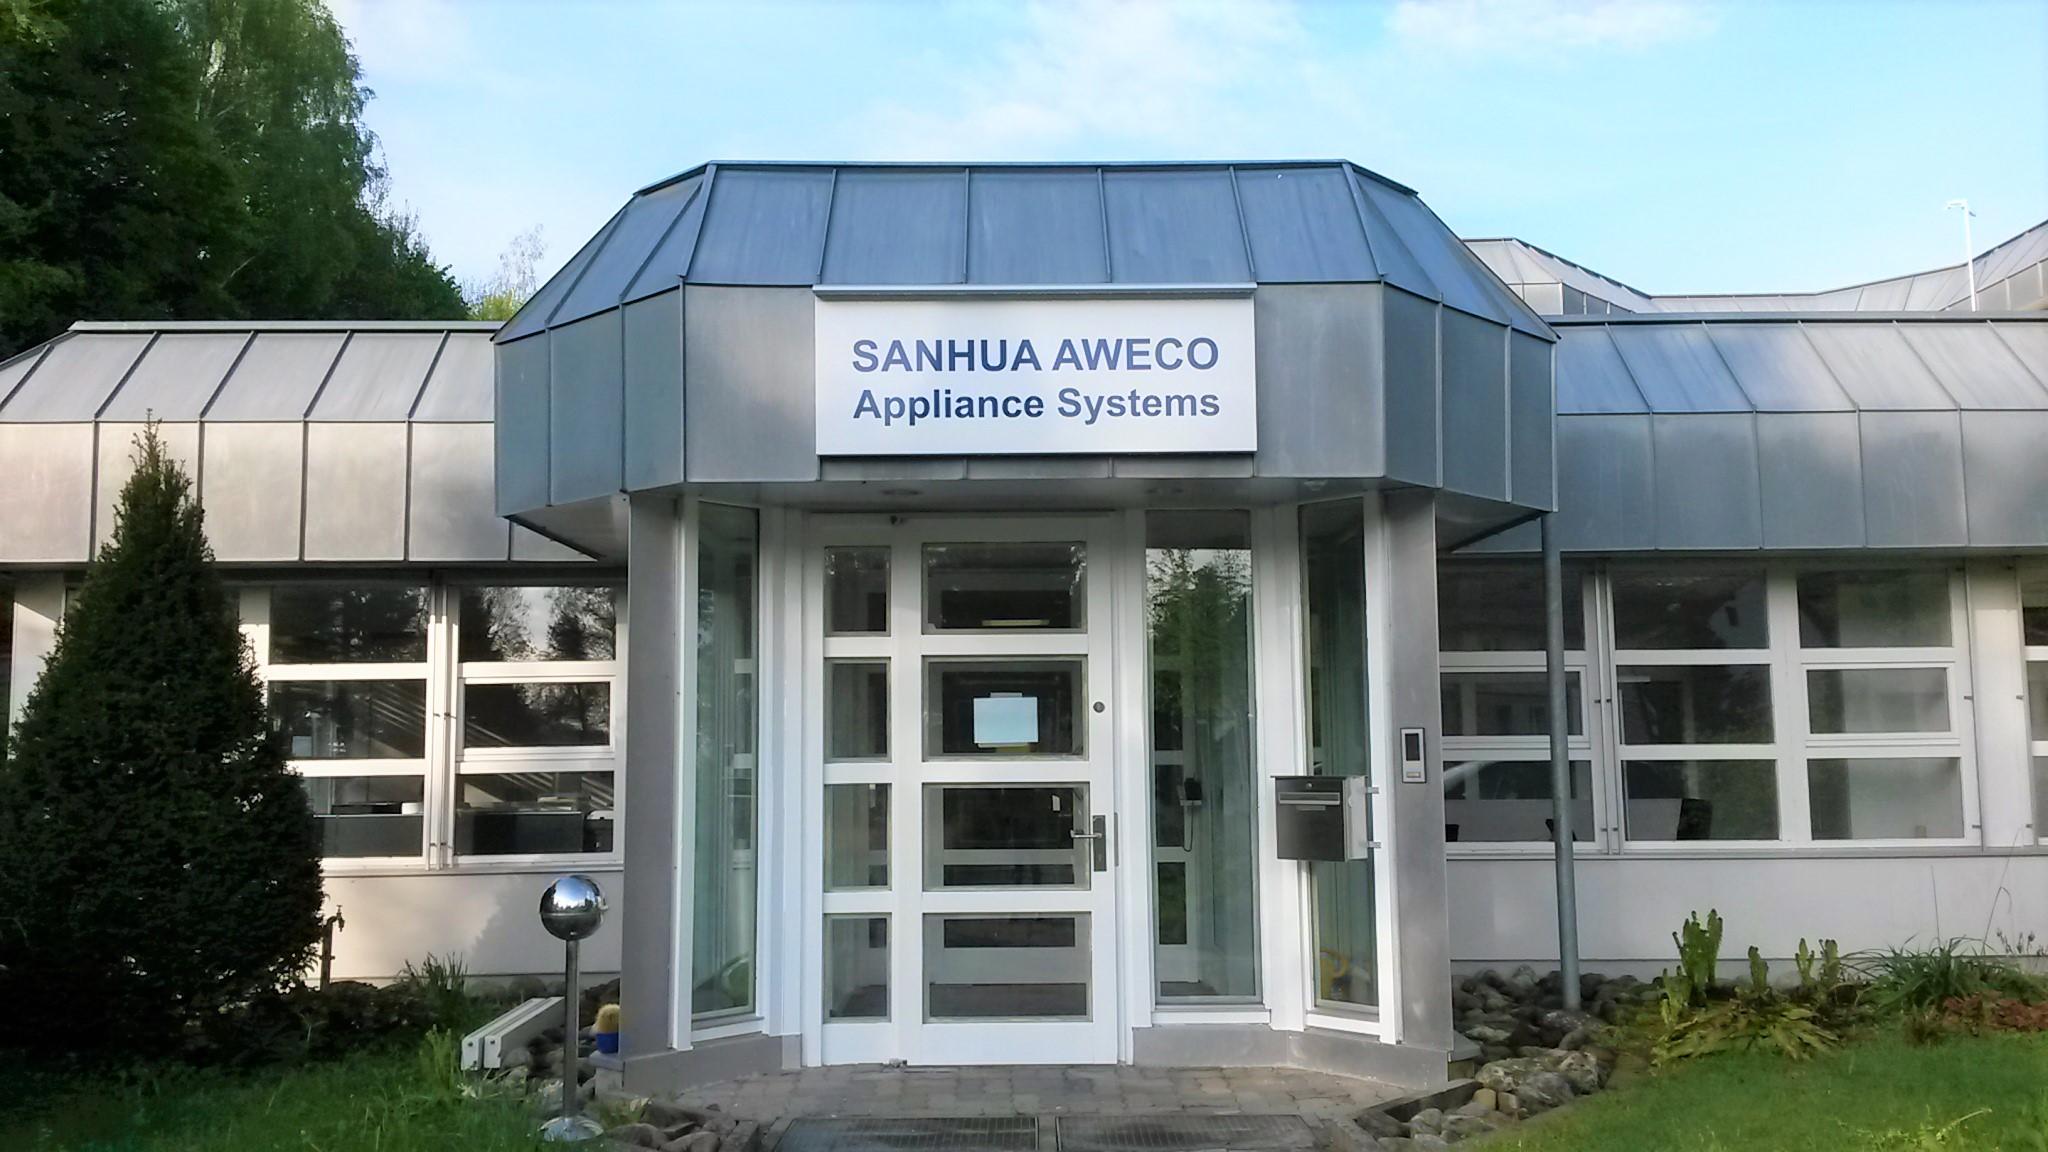 Neukirch, Germany. Sanhua Aweco